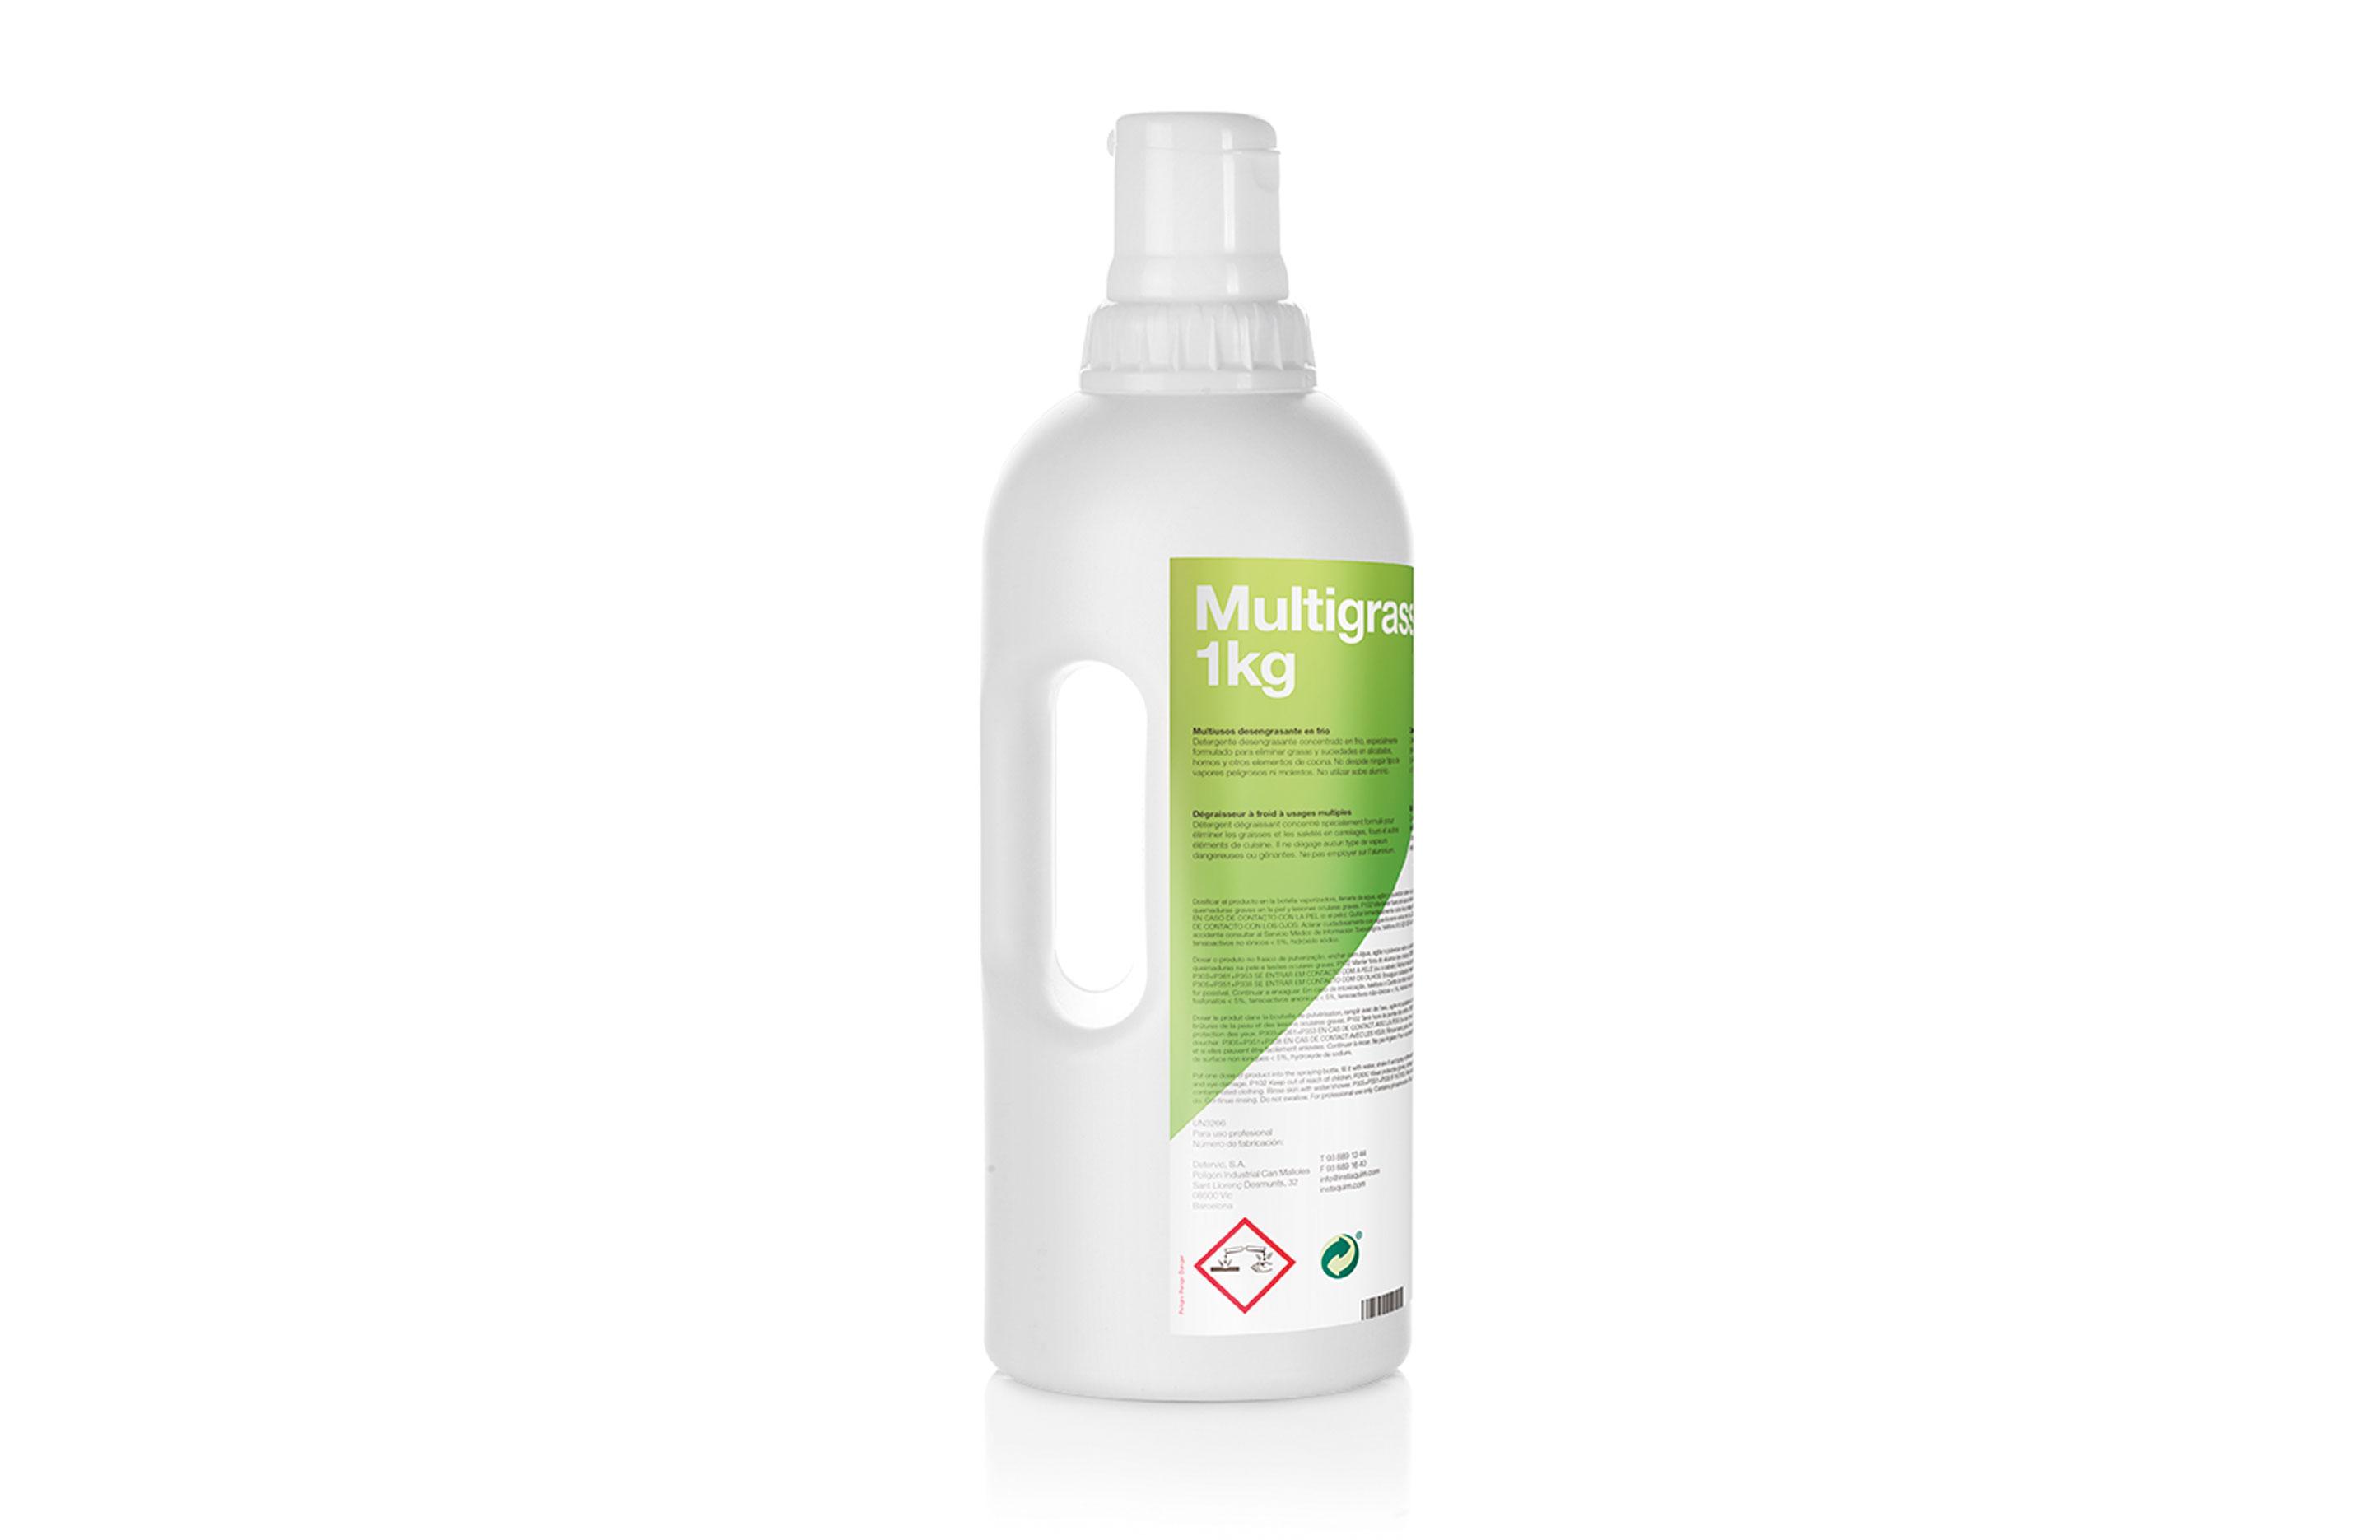 Multigrass, Multiusos desengrasante en frío - Autodosis